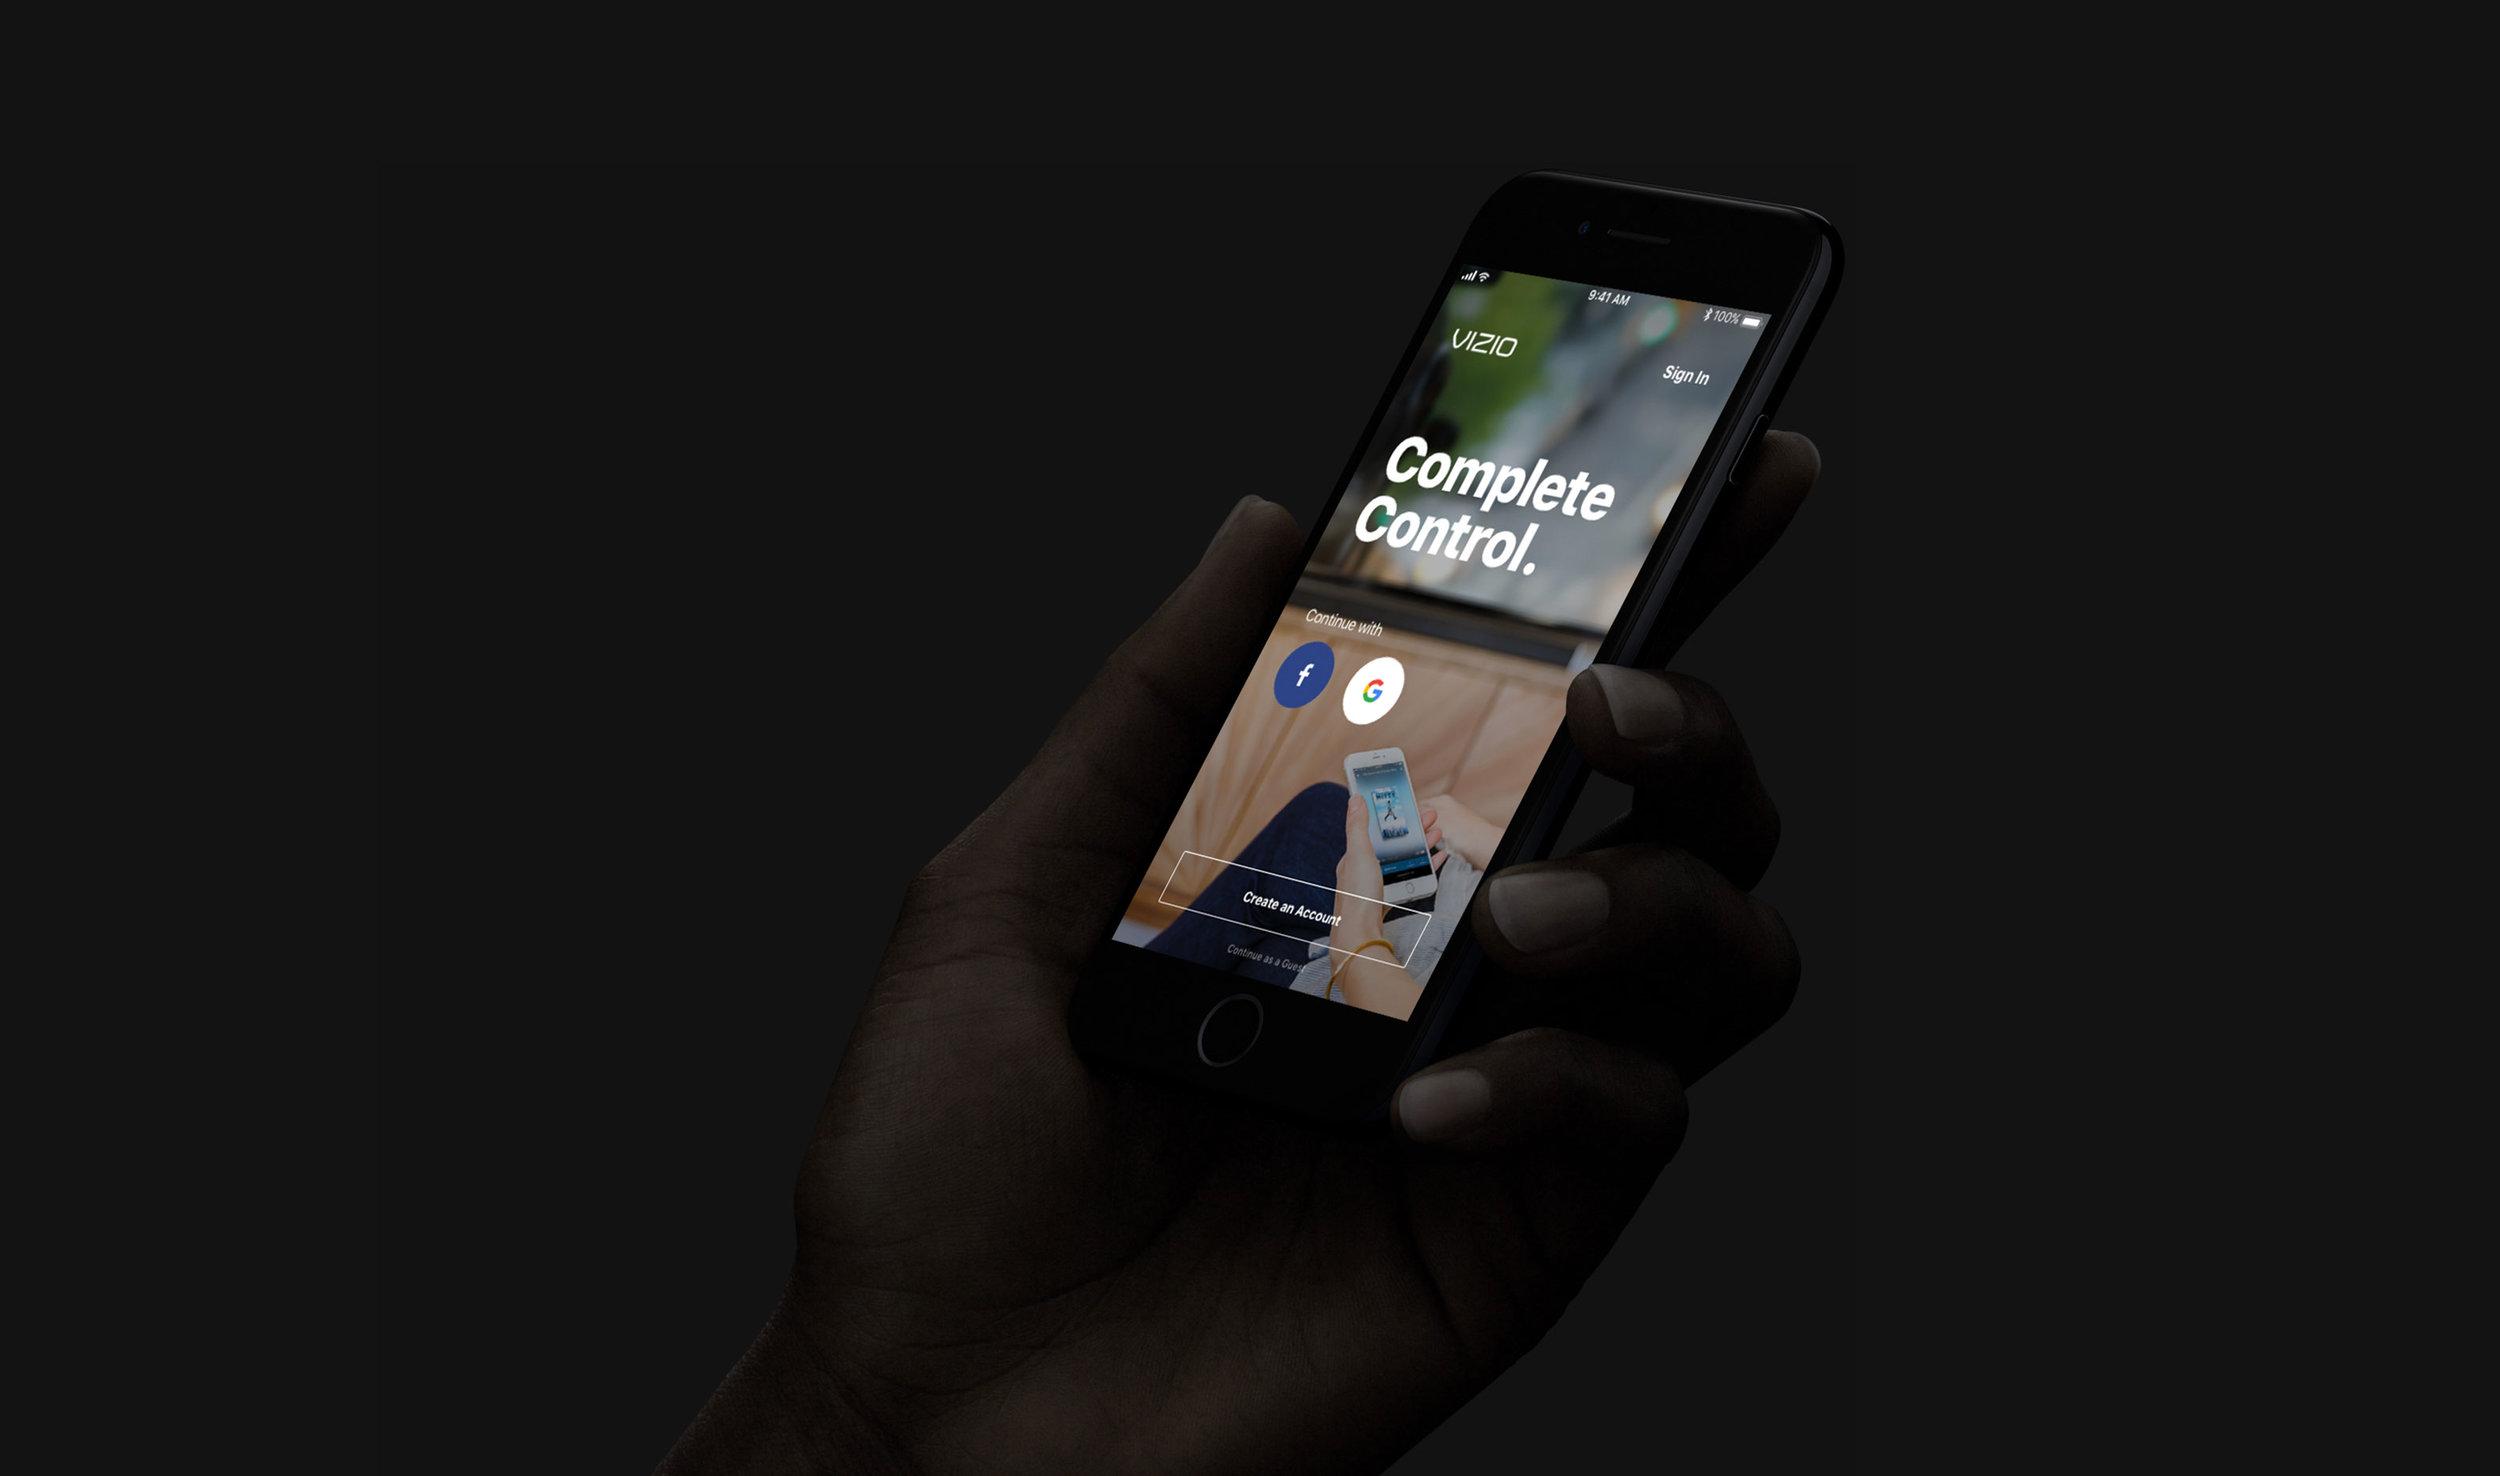 smartcast-splashscreen.jpg